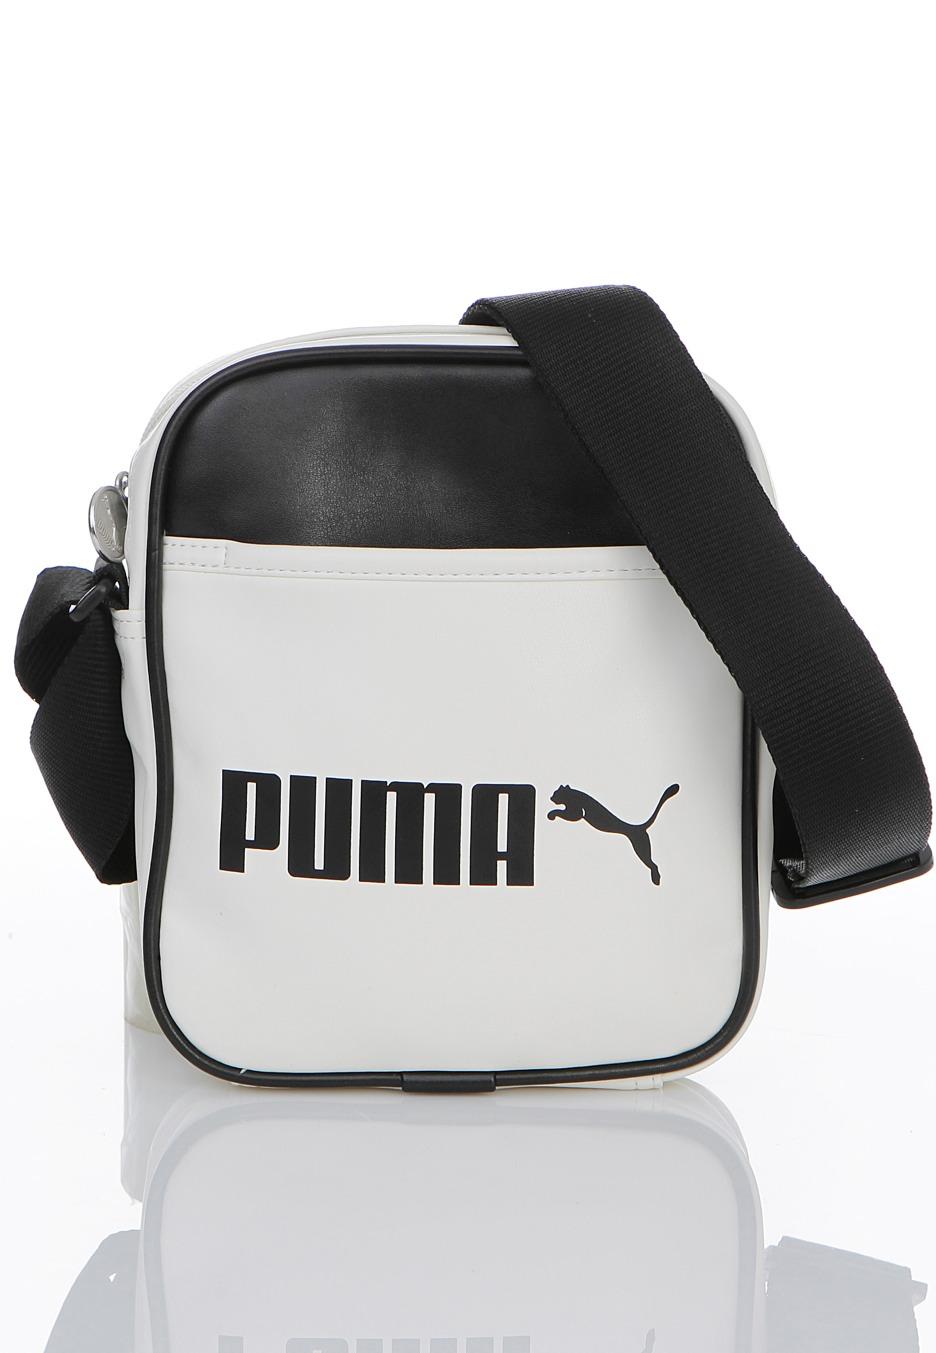 puma portable